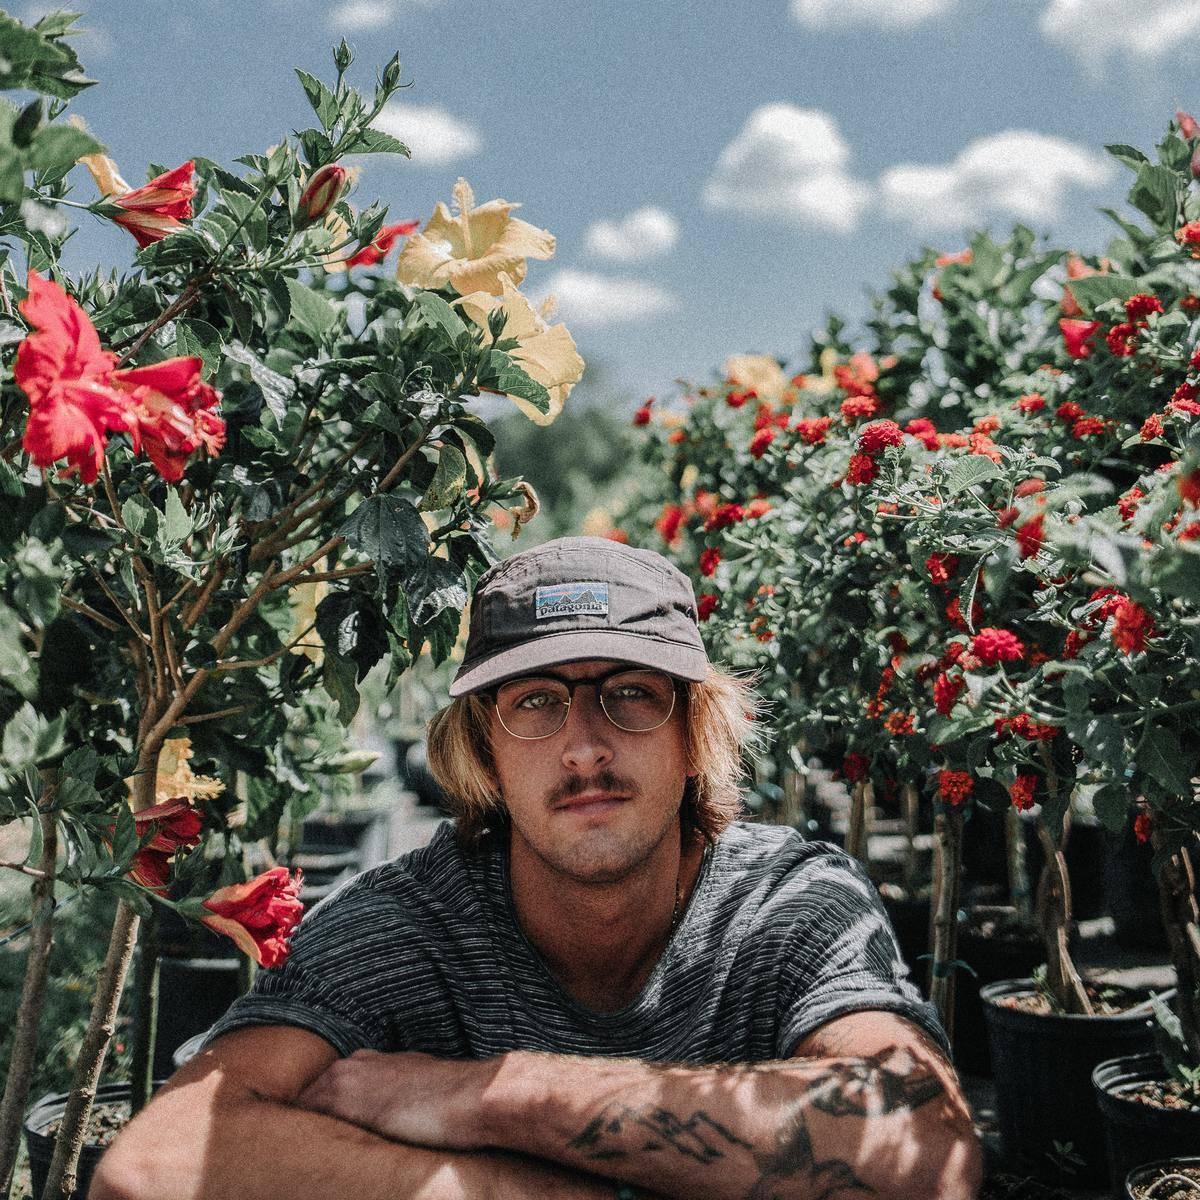 guy sitting around some plants